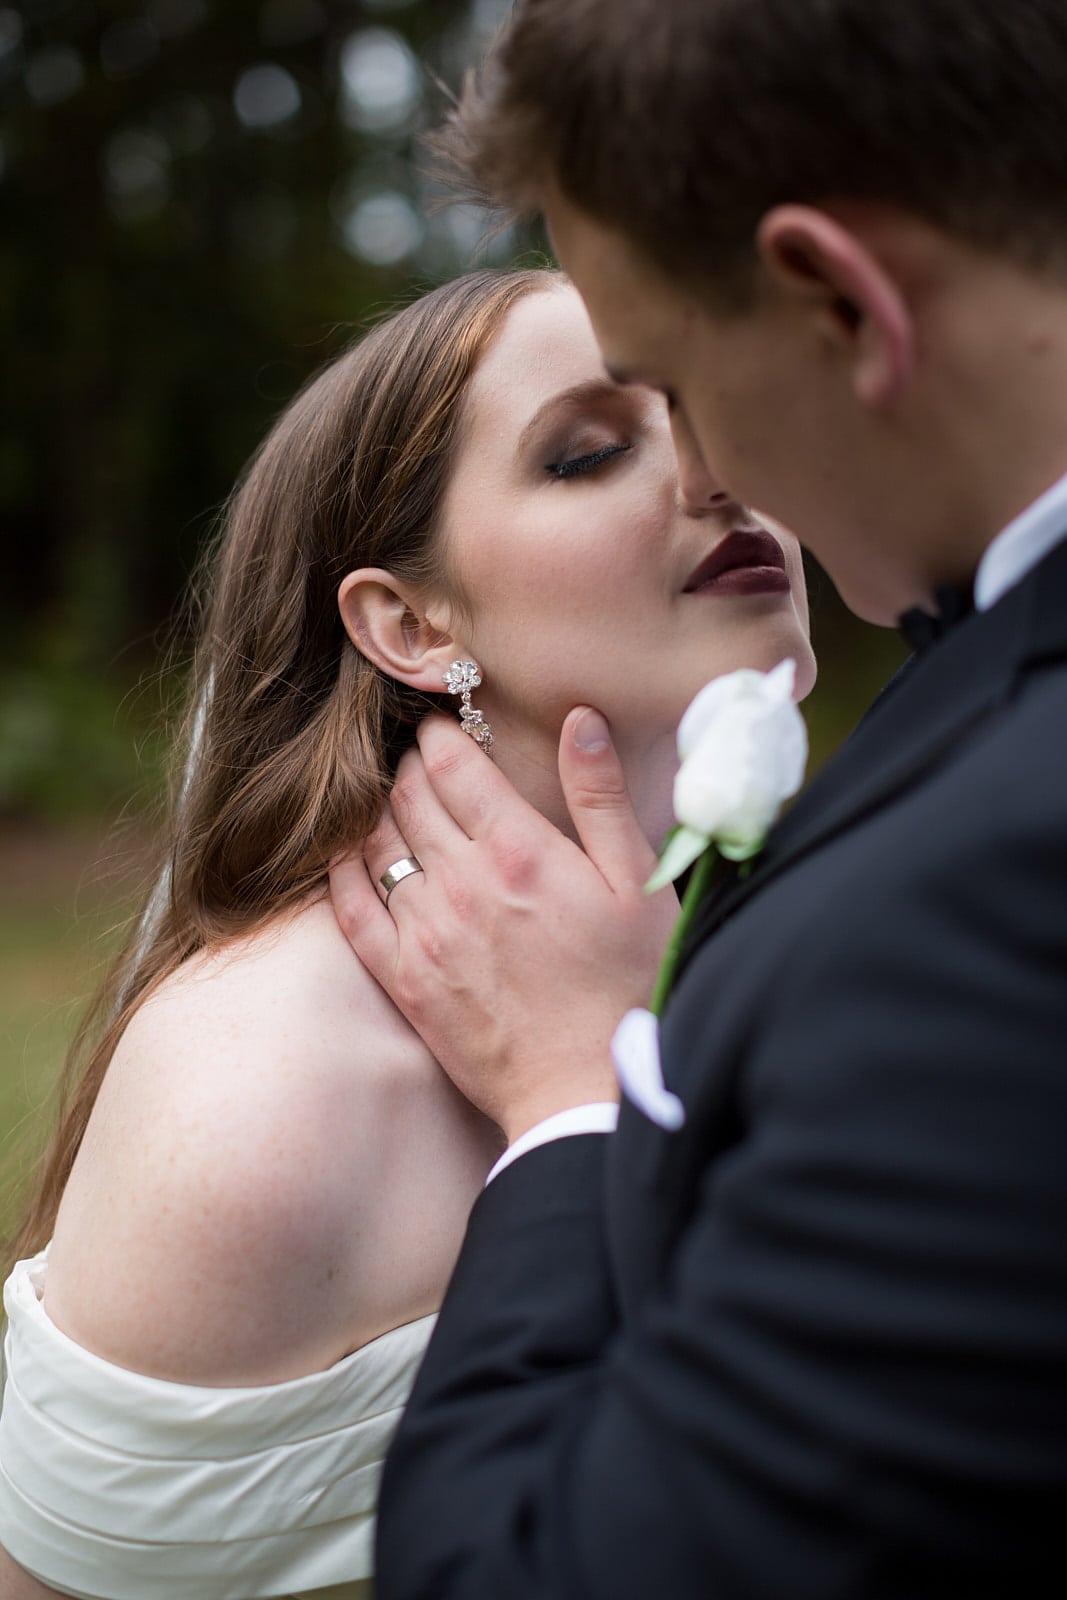 Atlanta Wedding bridal kissing portrait by Mike Glatzer